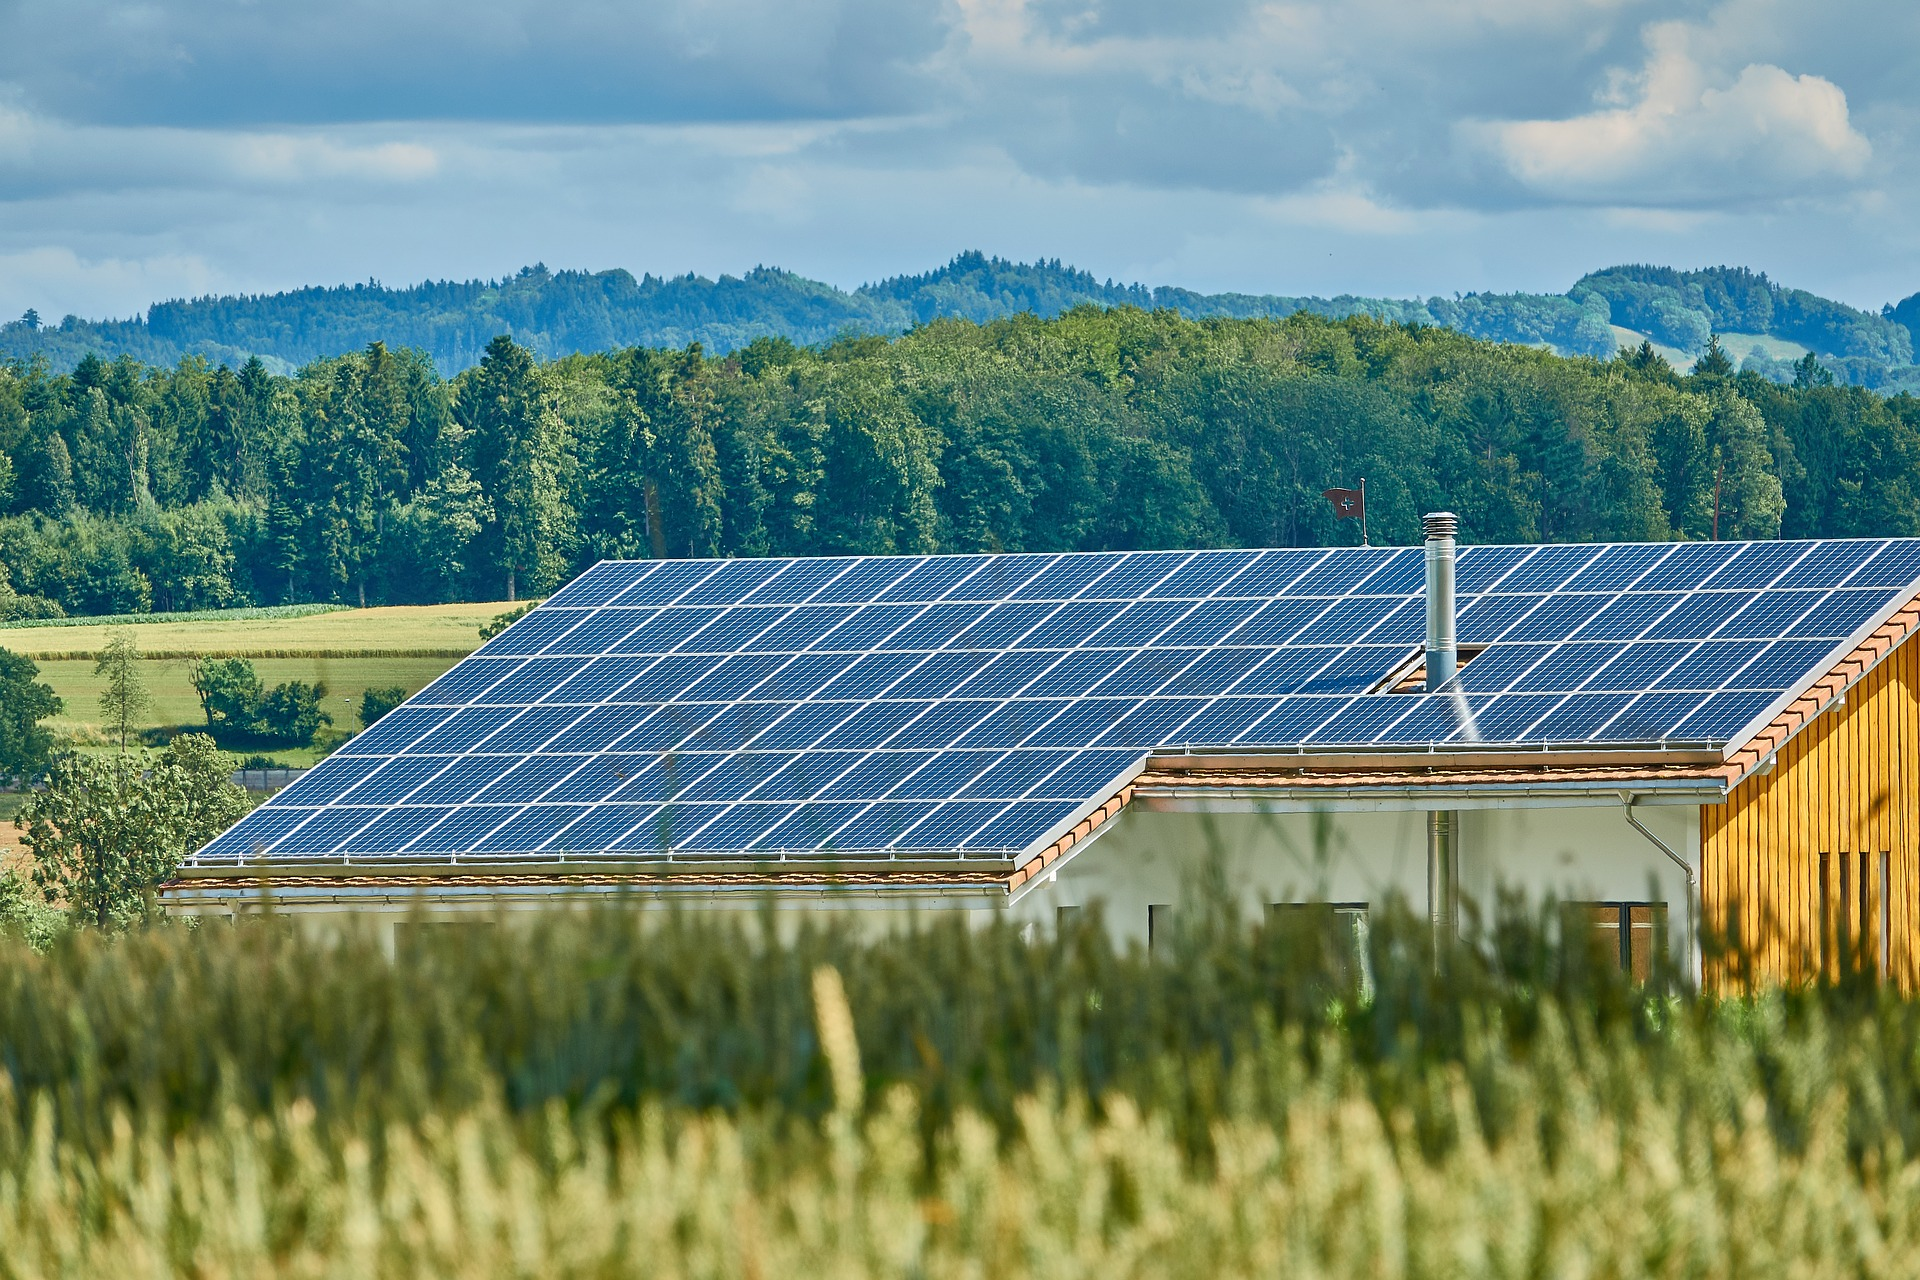 Should I get solar panels for my business?